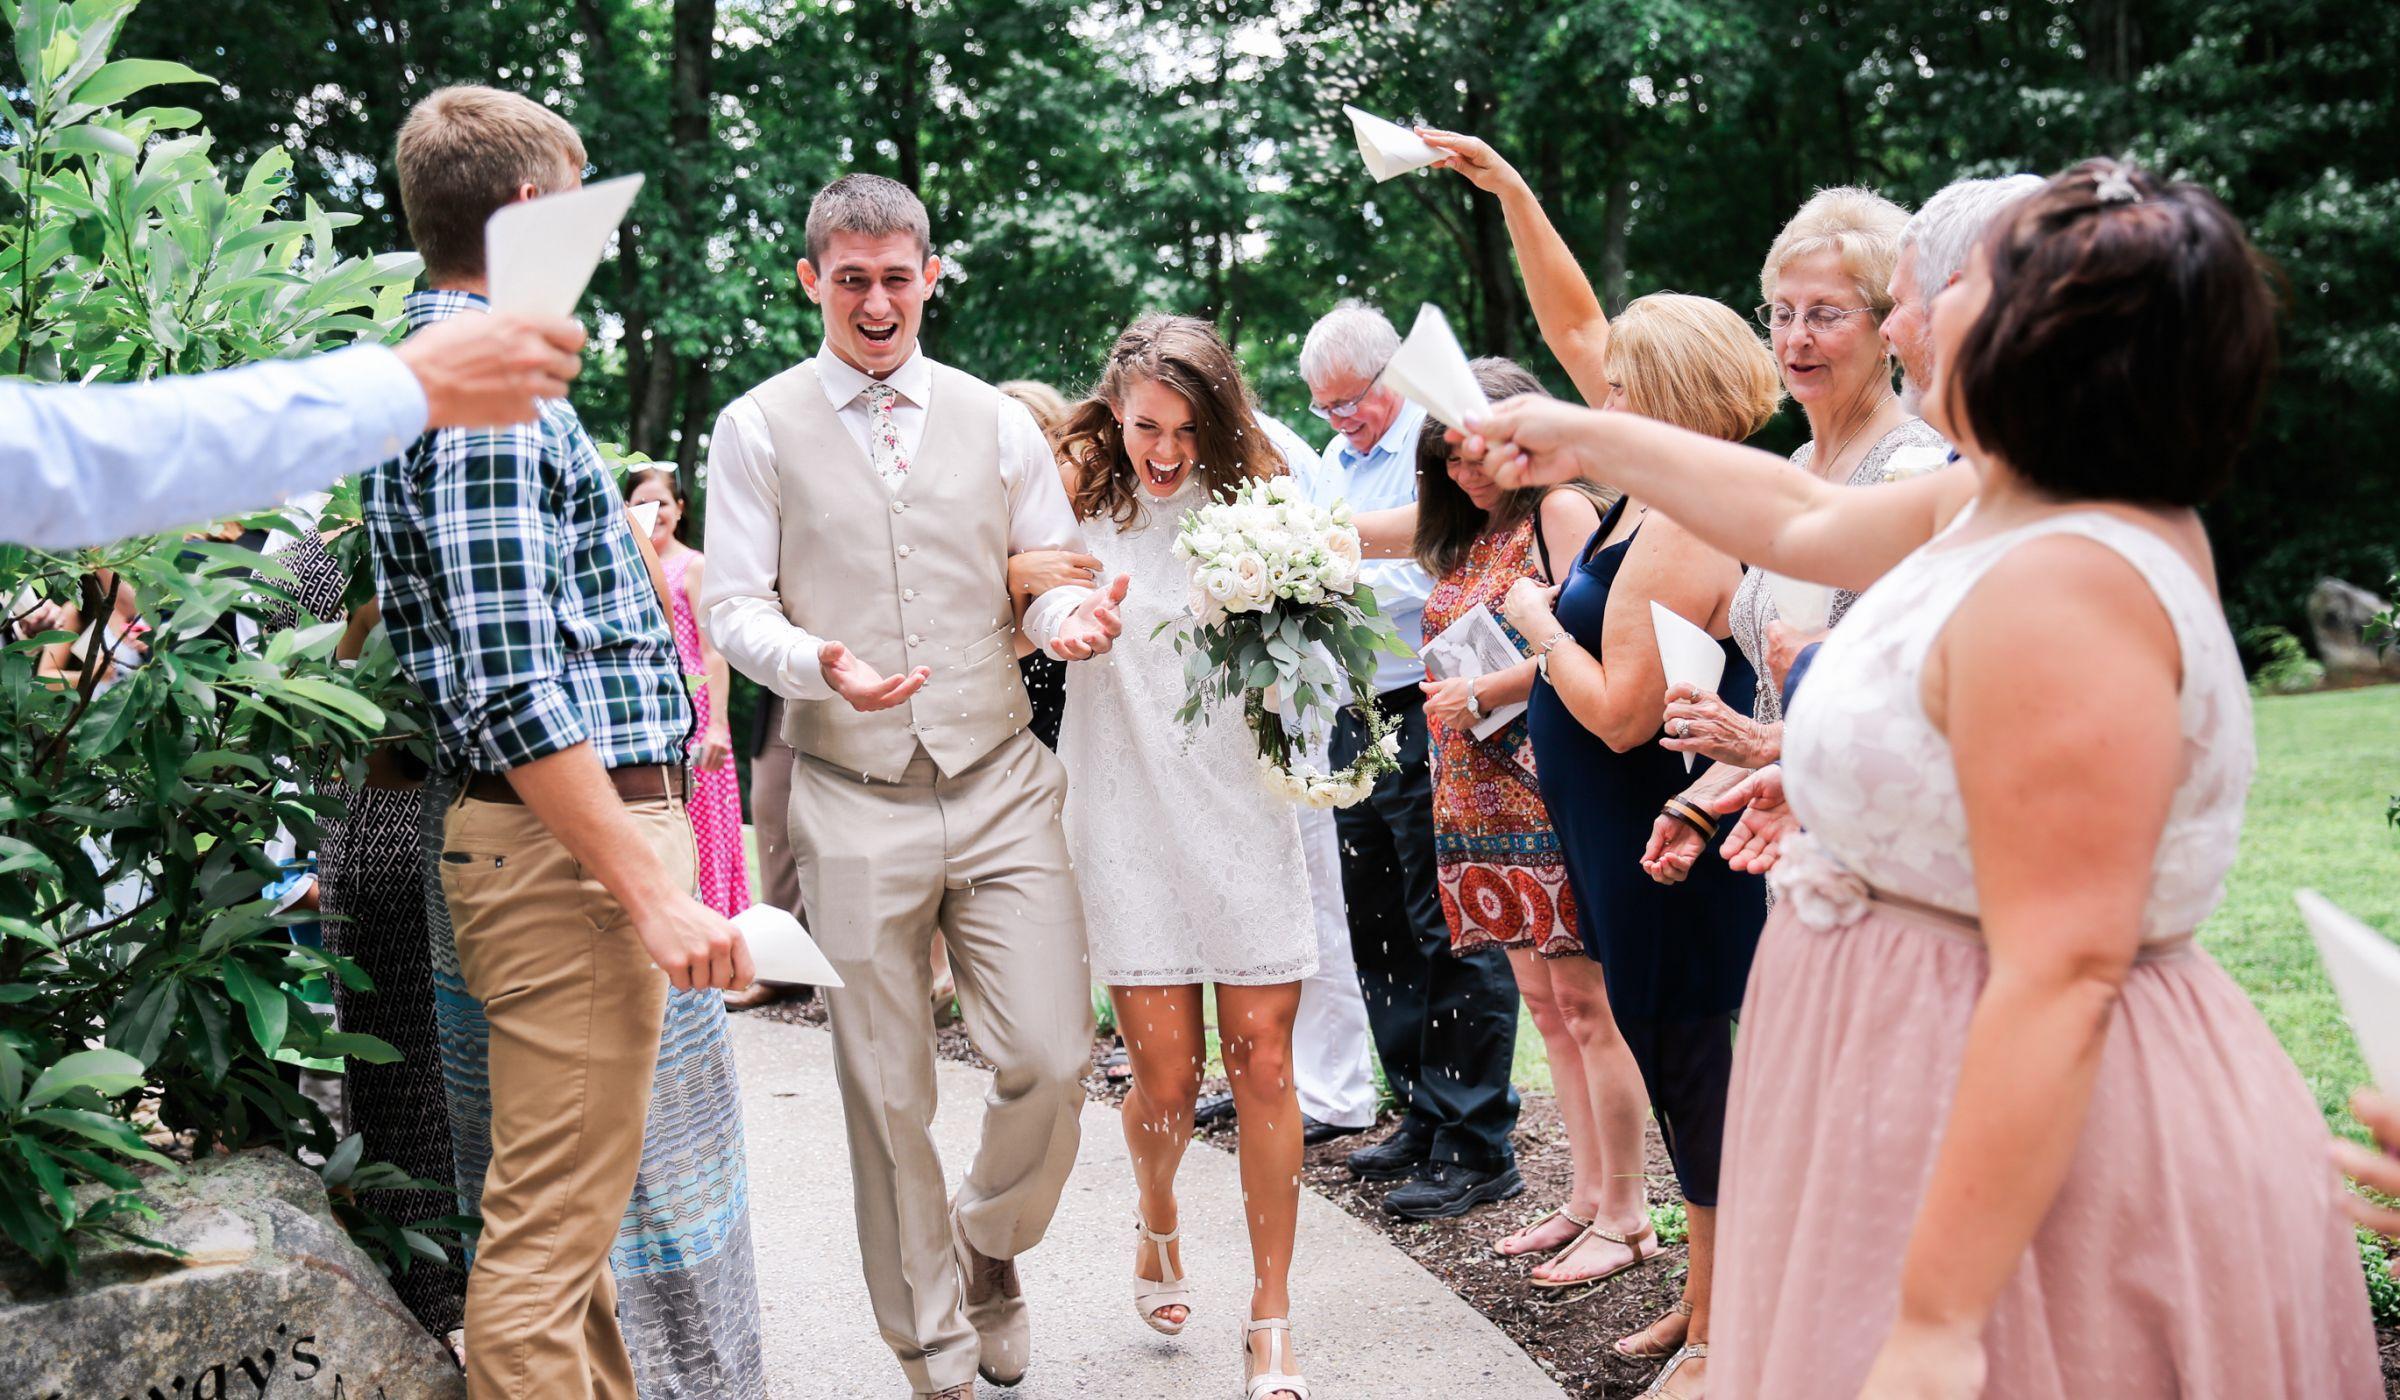 10 Creative Wedding SendOff Ideas That Aren't Sparklers